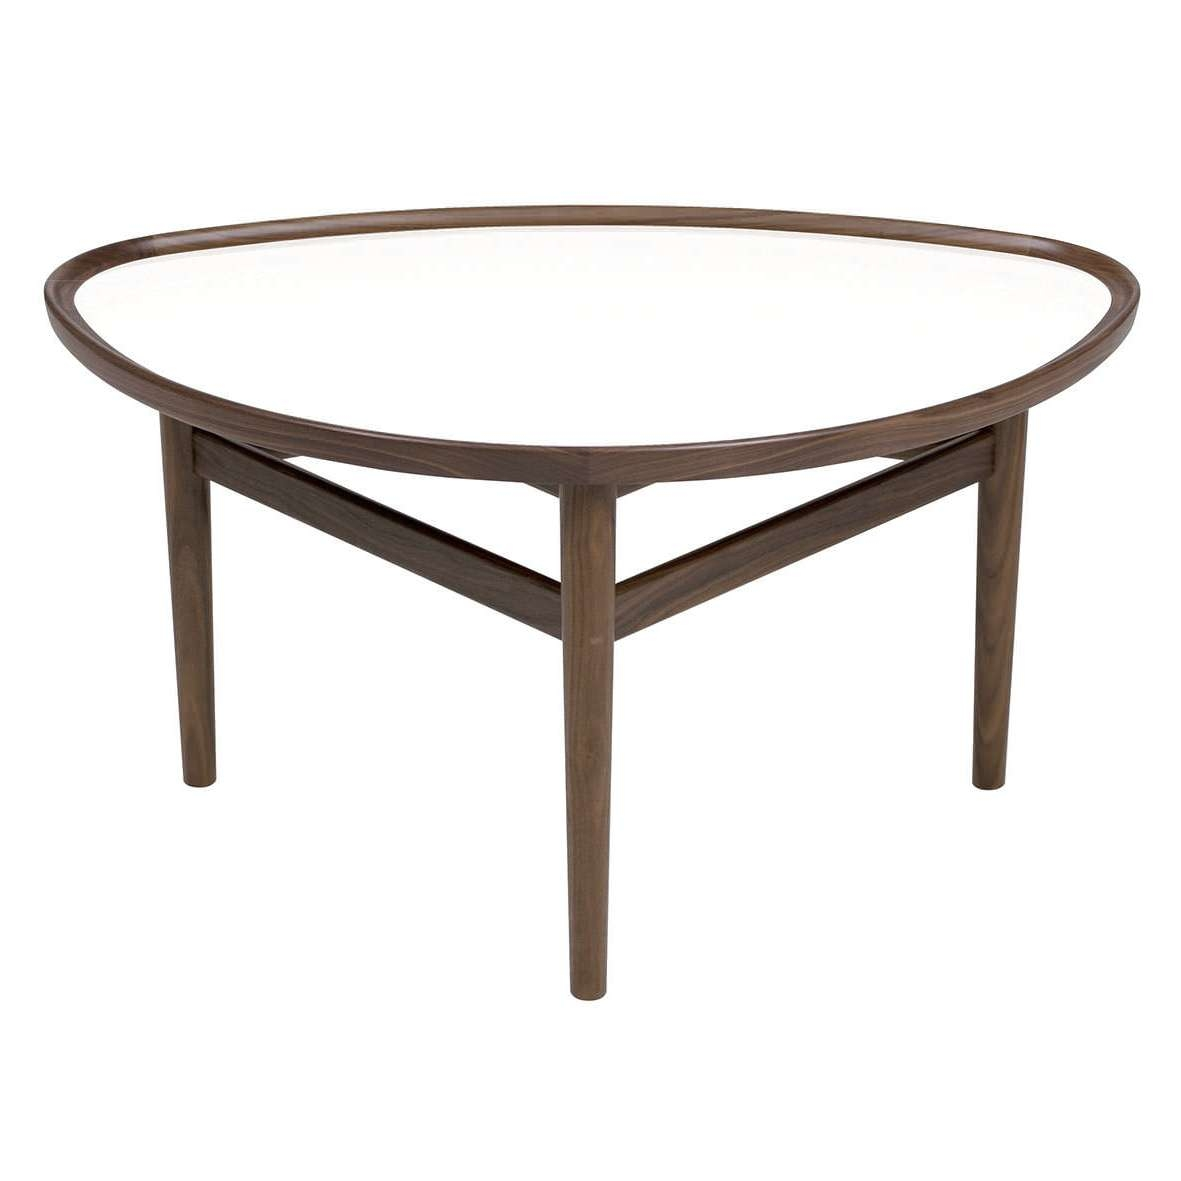 Scandinavian Design Coffee Table / Walnut / Teak / Oval – Eye In Most Up To Date Oval Walnut Coffee Tables (View 17 of 20)